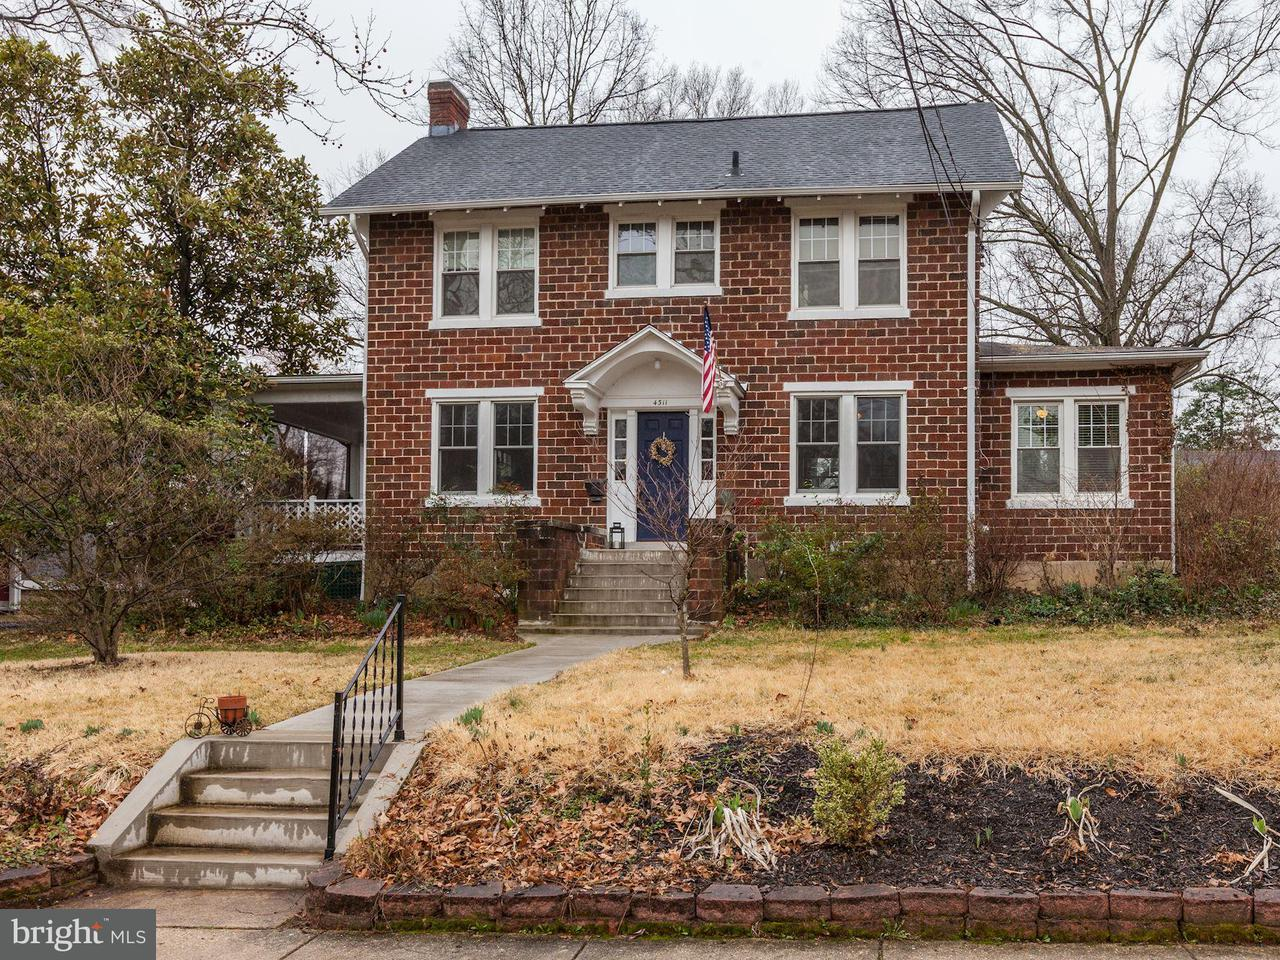 Single Family Home for Sale at 4311 Sheridan Street 4311 Sheridan Street University Park, Maryland 20782 United States